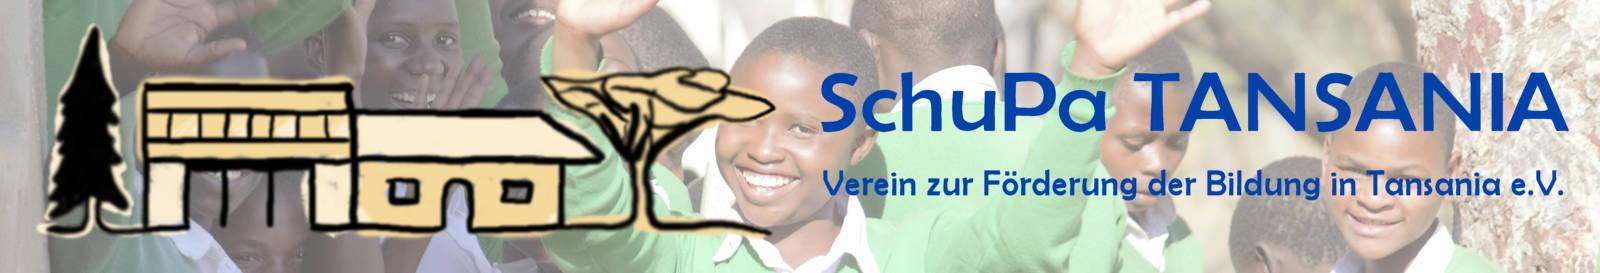 SchuPa Tansania